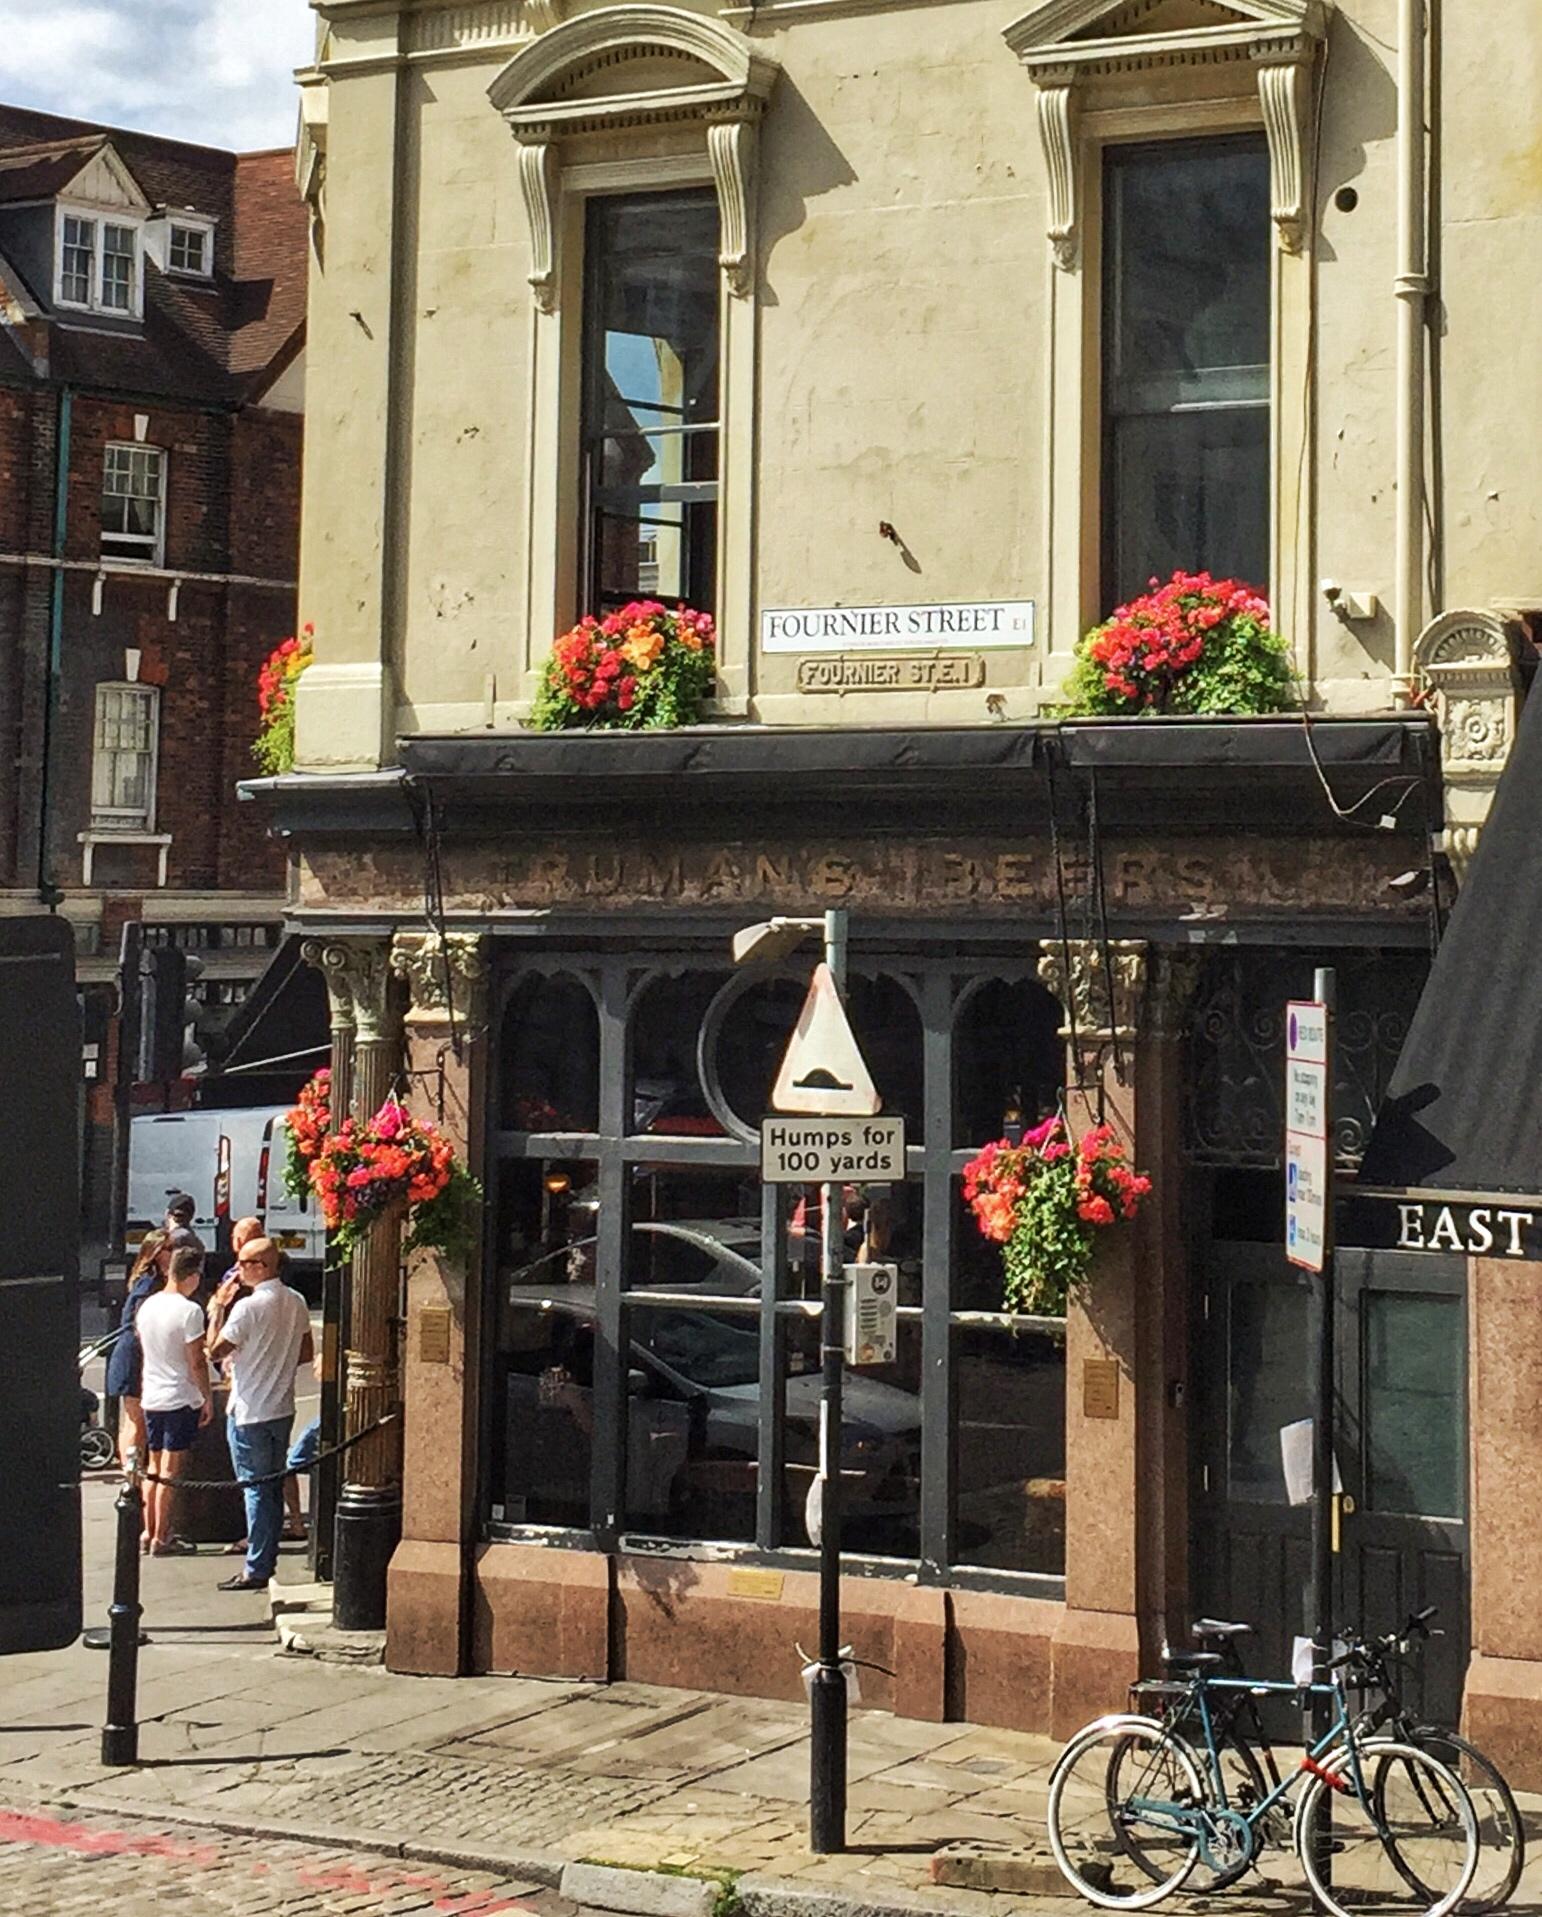 The Ten Bells Pub on Fournier Street